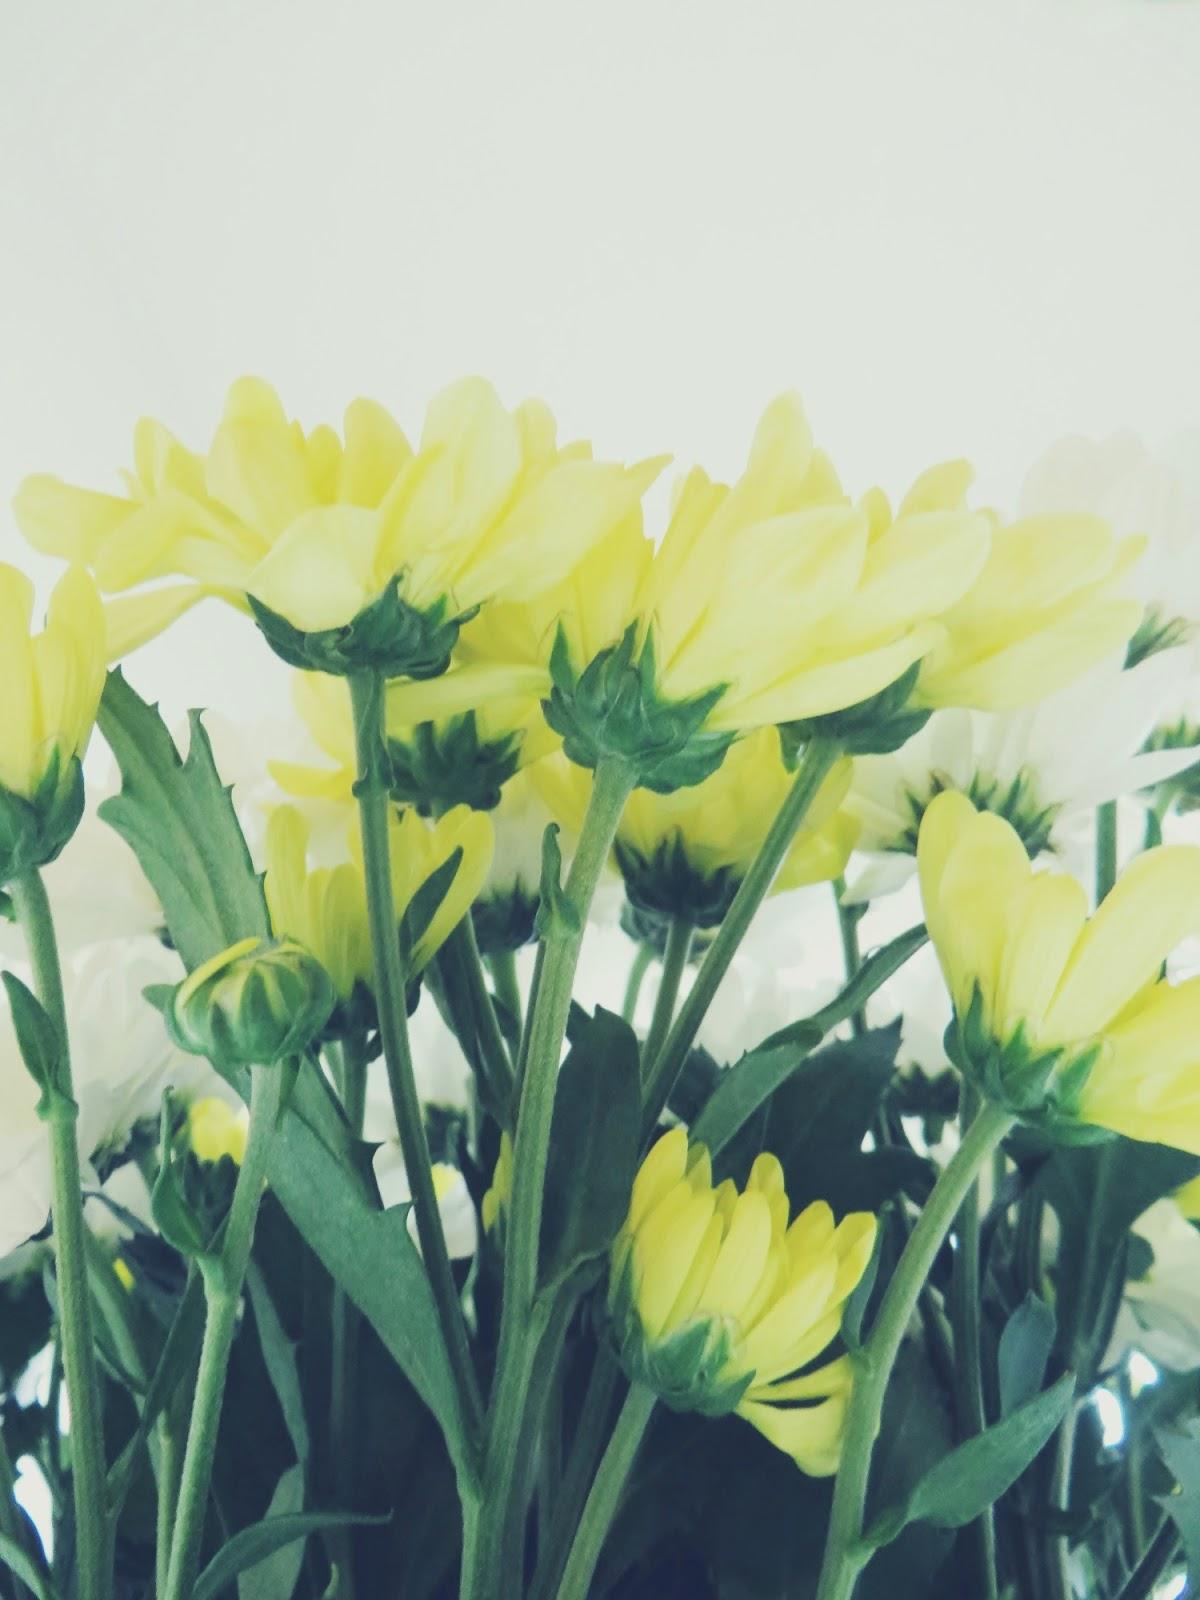 flowers, krysanteemit, krysanteemi, kukat, kukkia